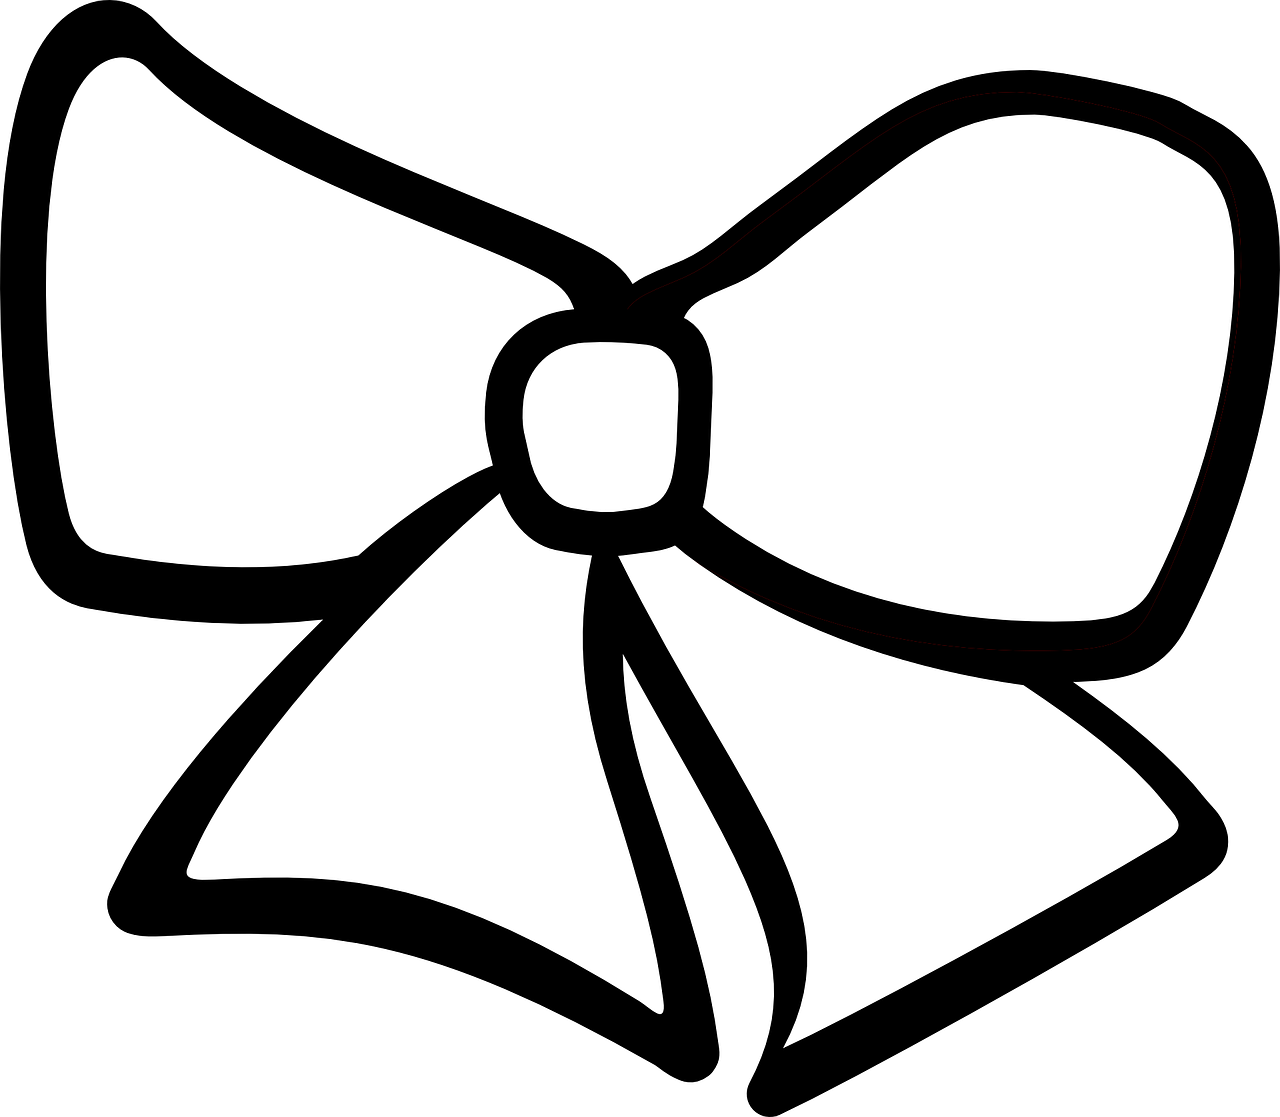 Ribbon Hair Bow   Free vector graphic on Pixabay